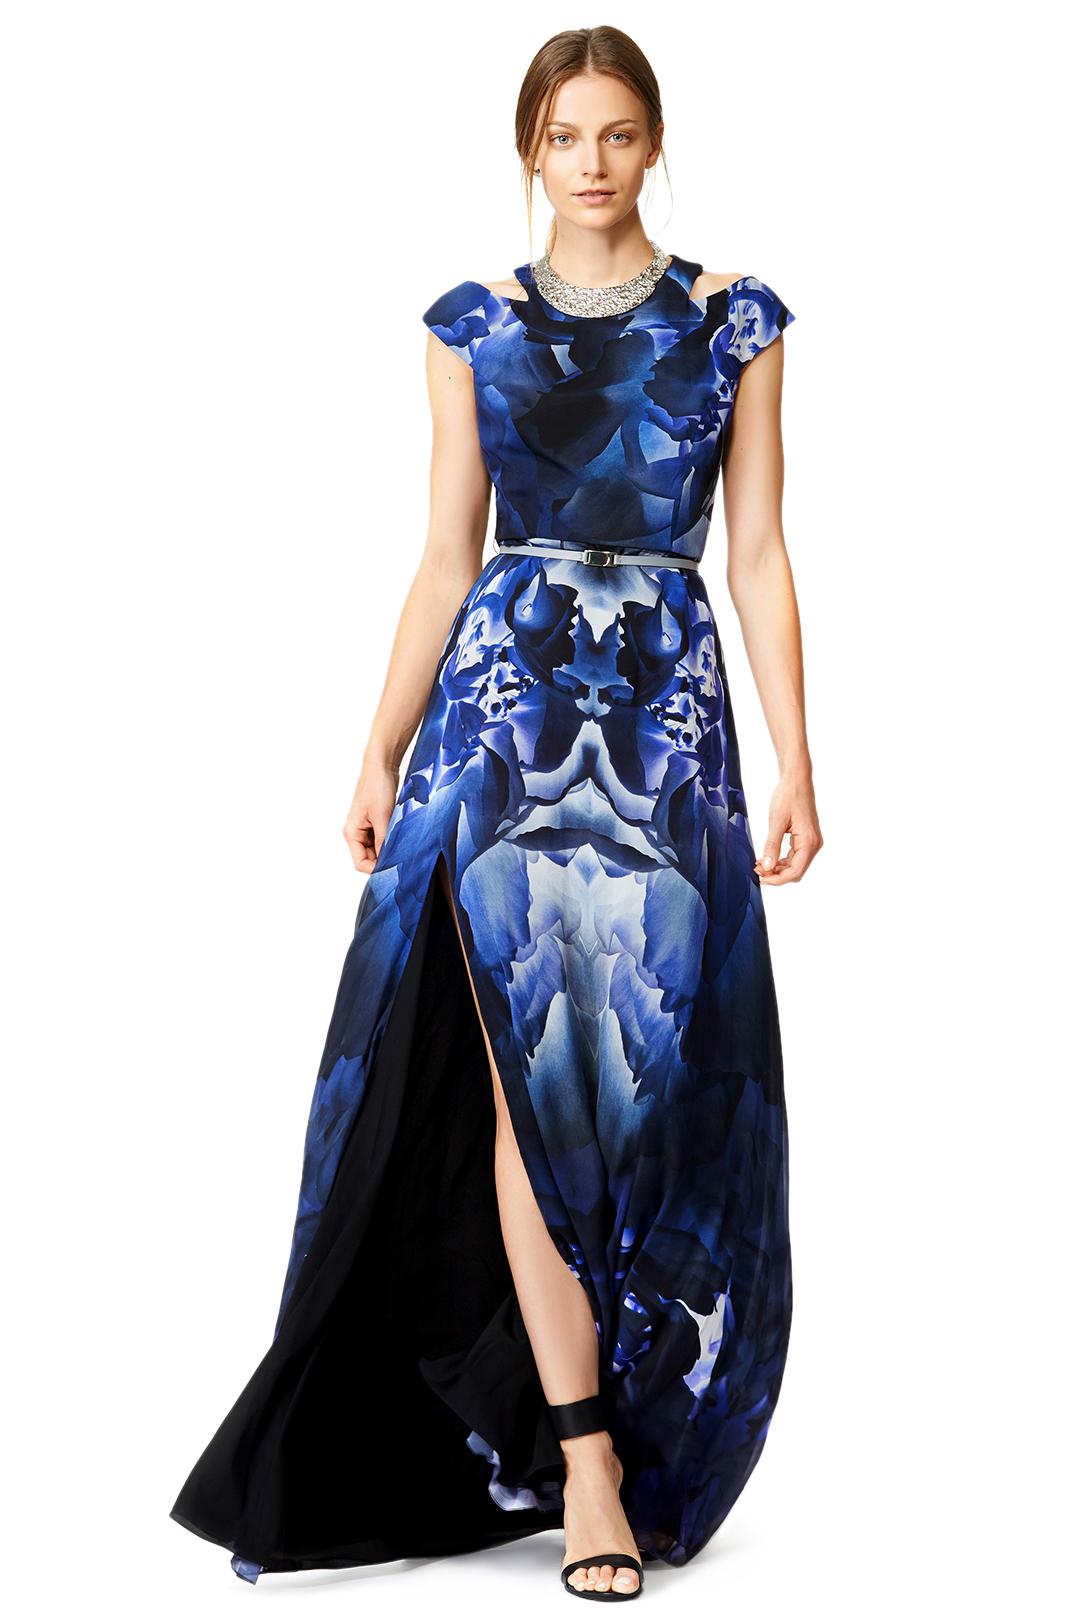 GABRIELA CADENA Mirror Mirror Gown